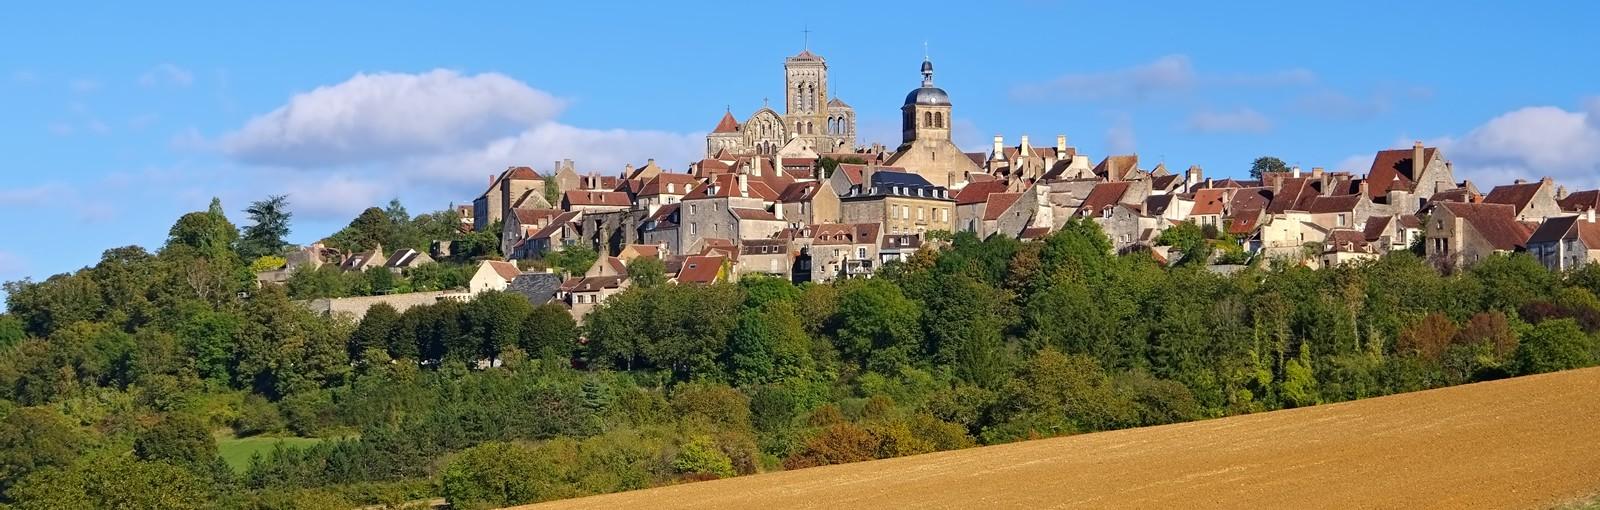 Tours 2 días en Borgoña: recorrido del Yonne y de los viñedos de 'Côtes de Beaune' - Borgoña - Circuitos desde Paris